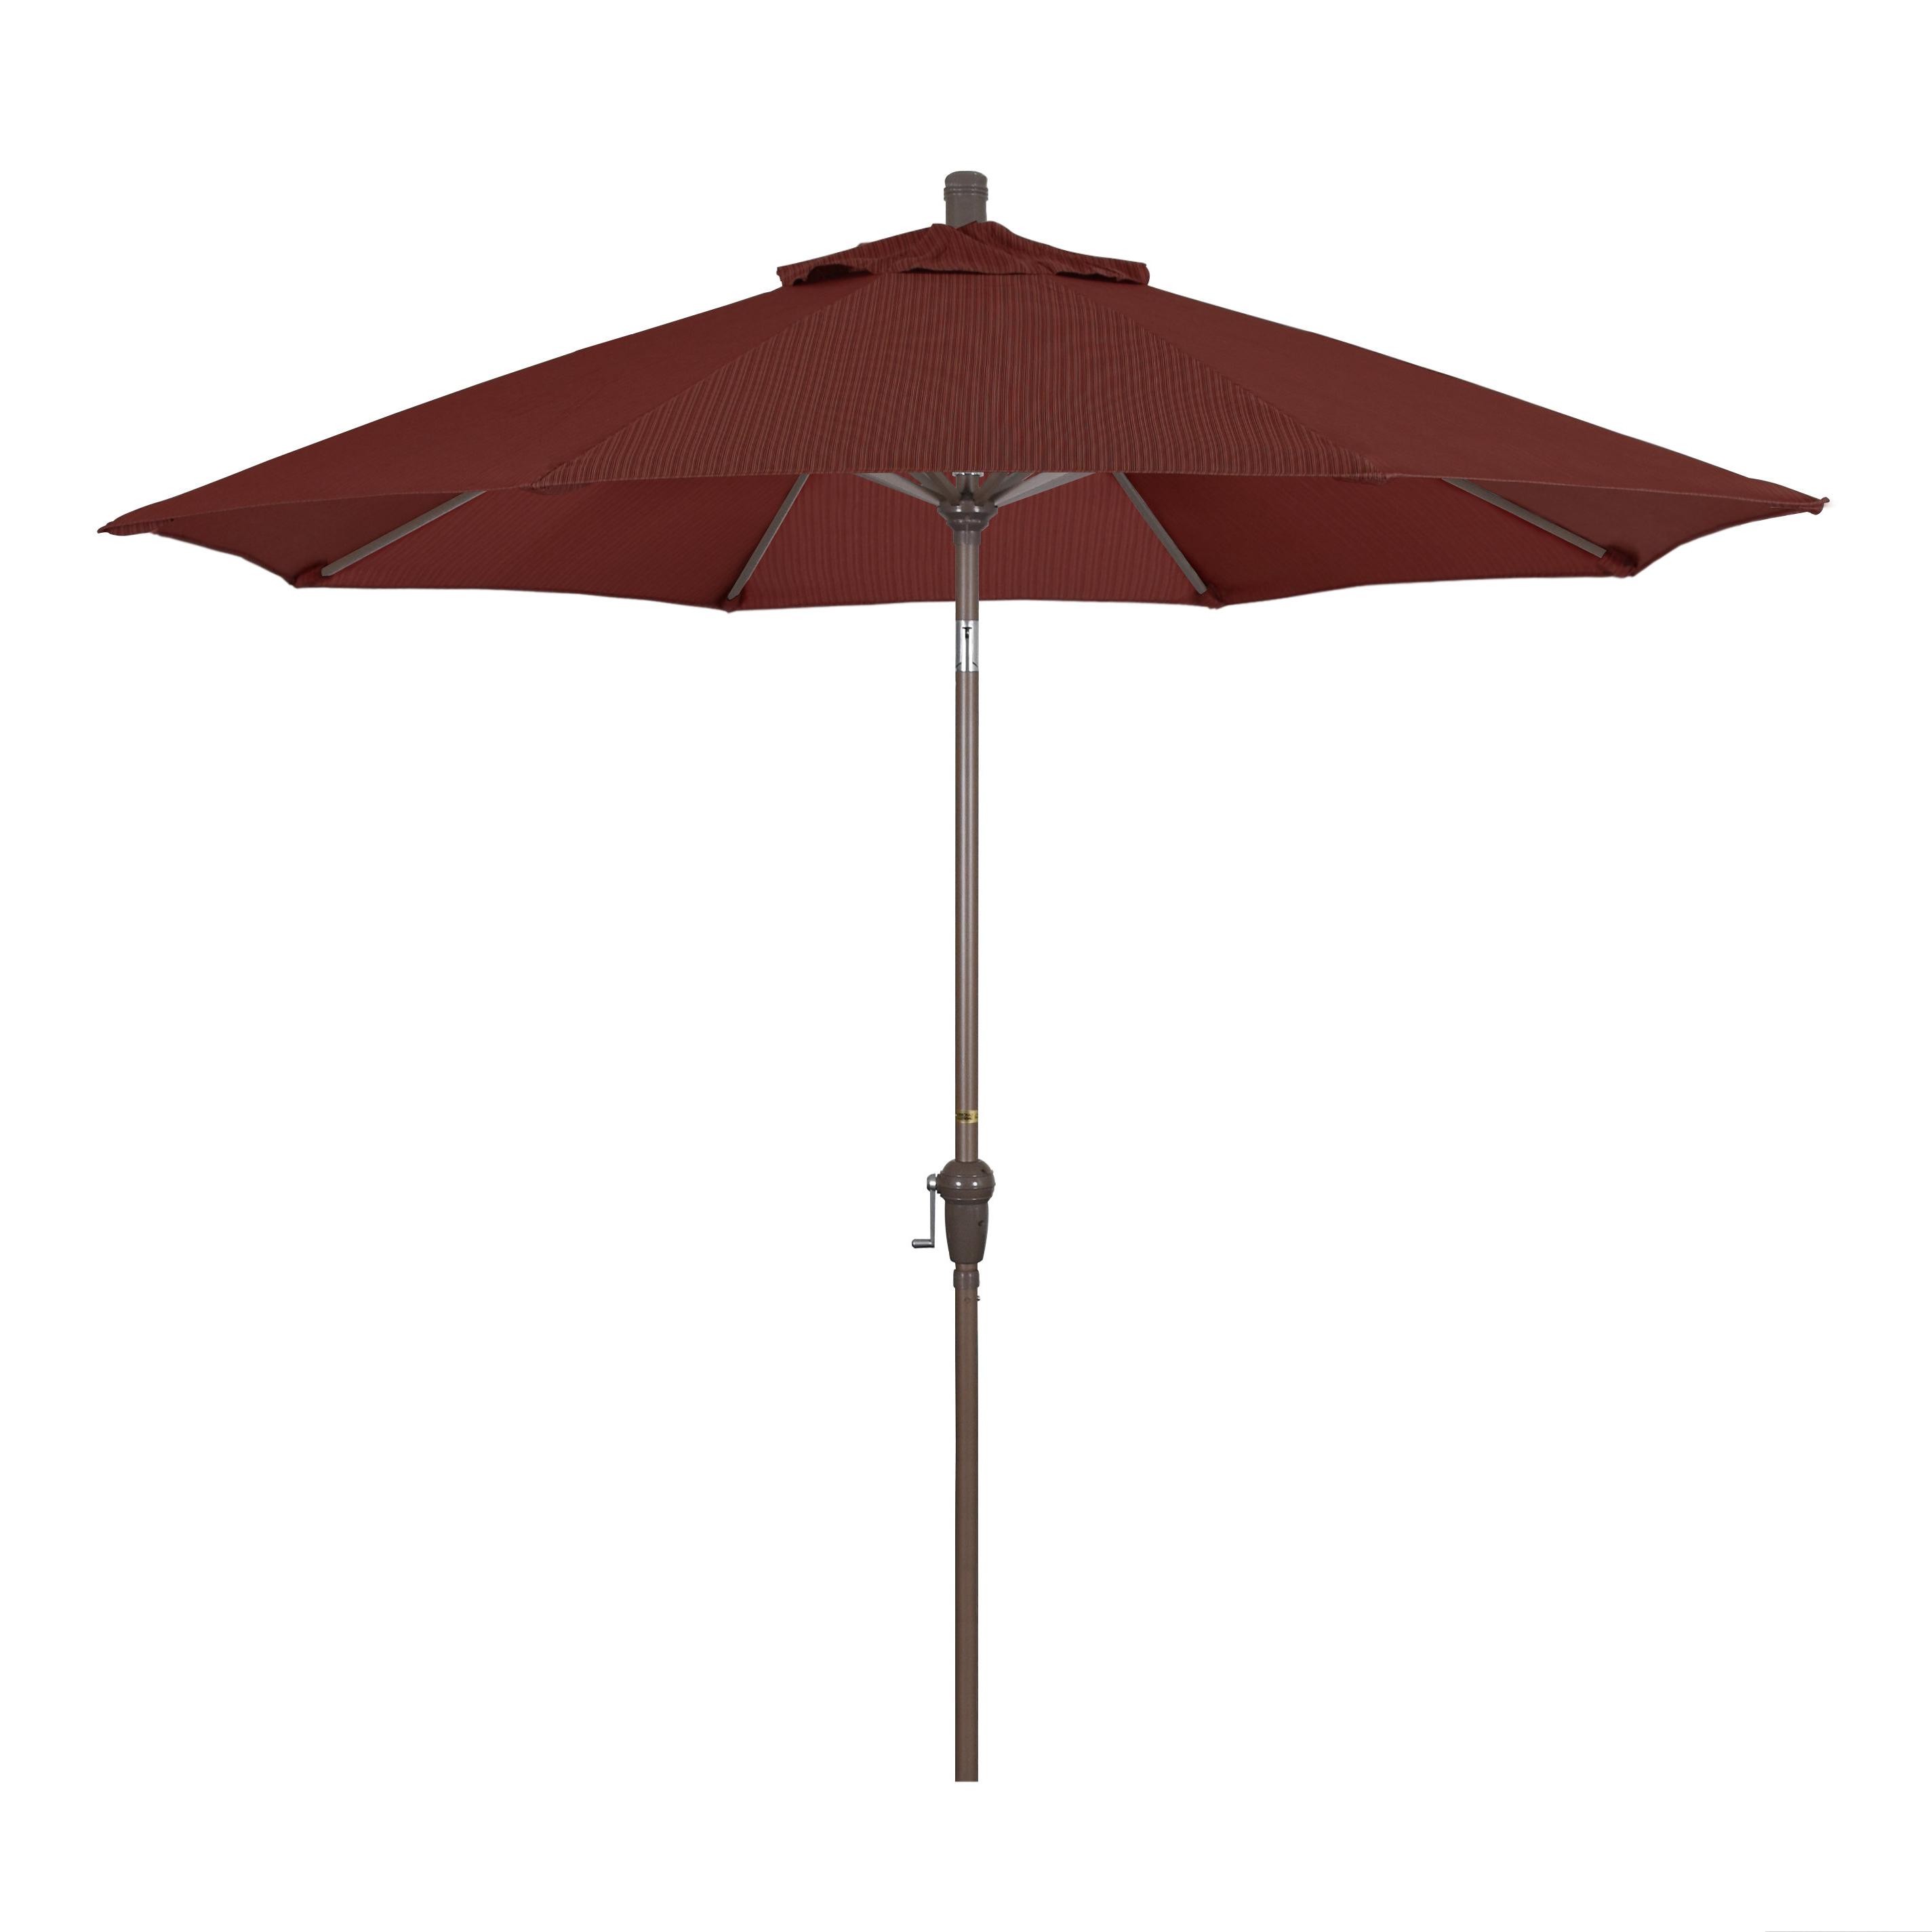 Preferred Brookland Market Umbrellas Inside Mullaney 9' Market Umbrella (View 15 of 20)